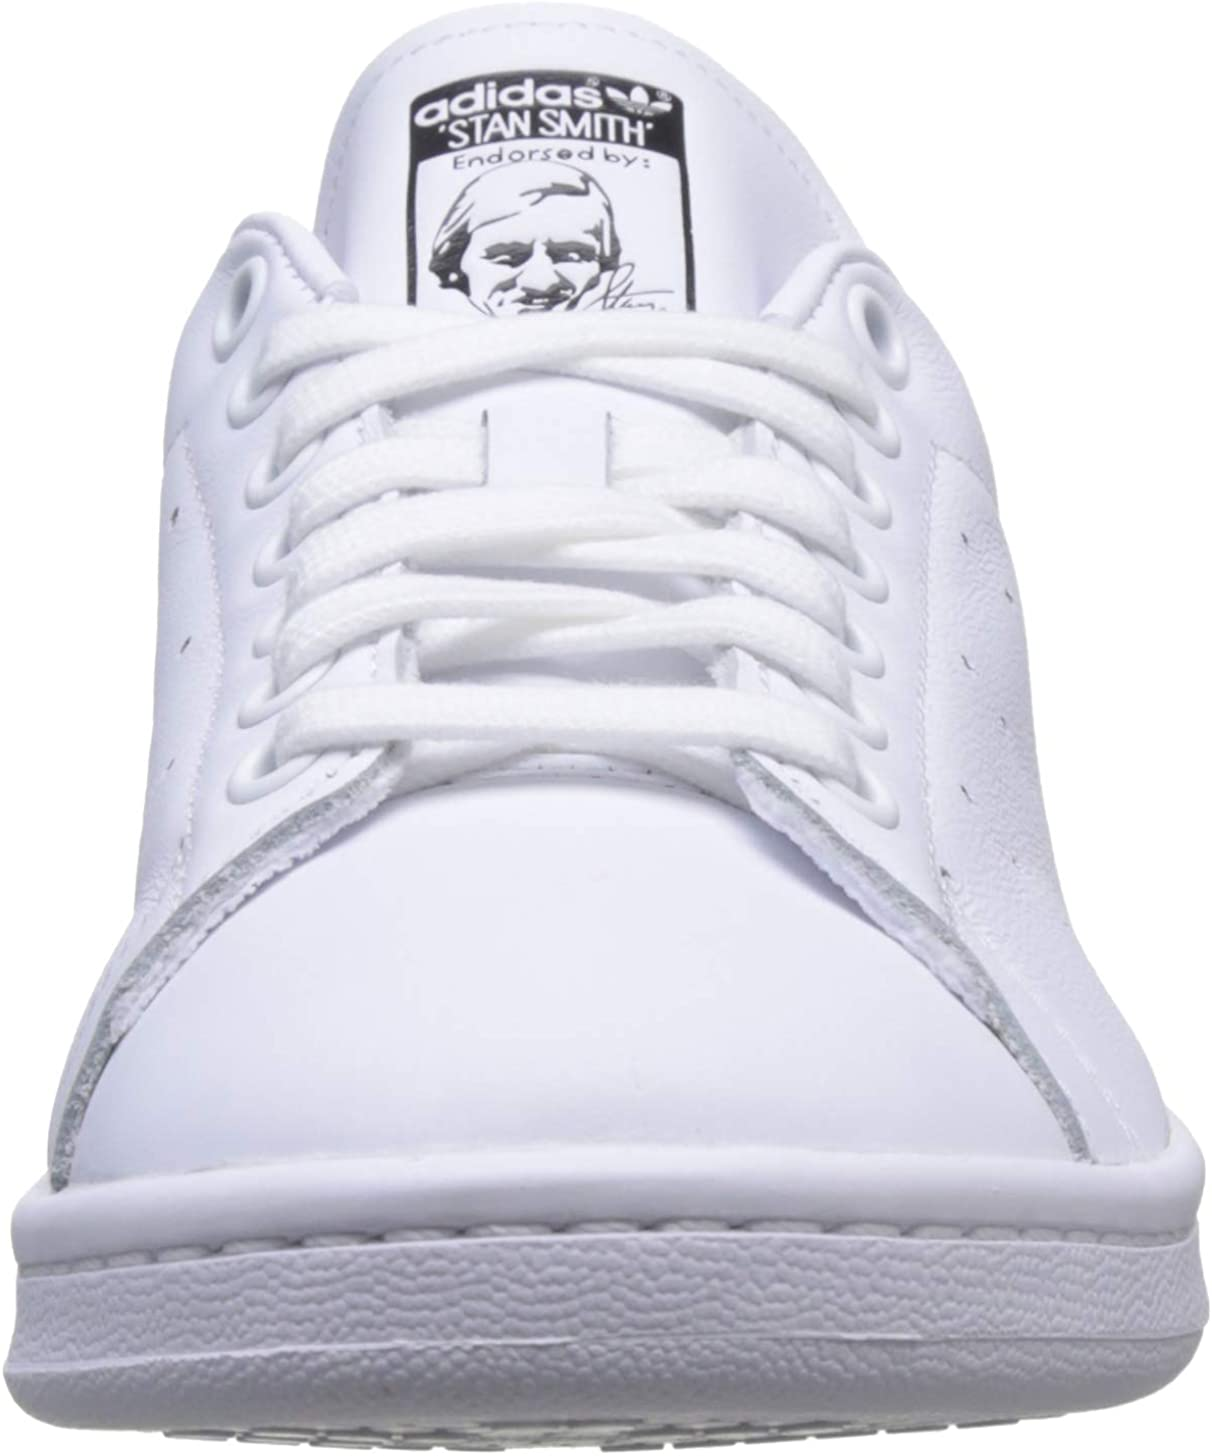 Adidas Stan Smith, Chaussures De Gymnastique Homme Blanc Ftwr White Core Black